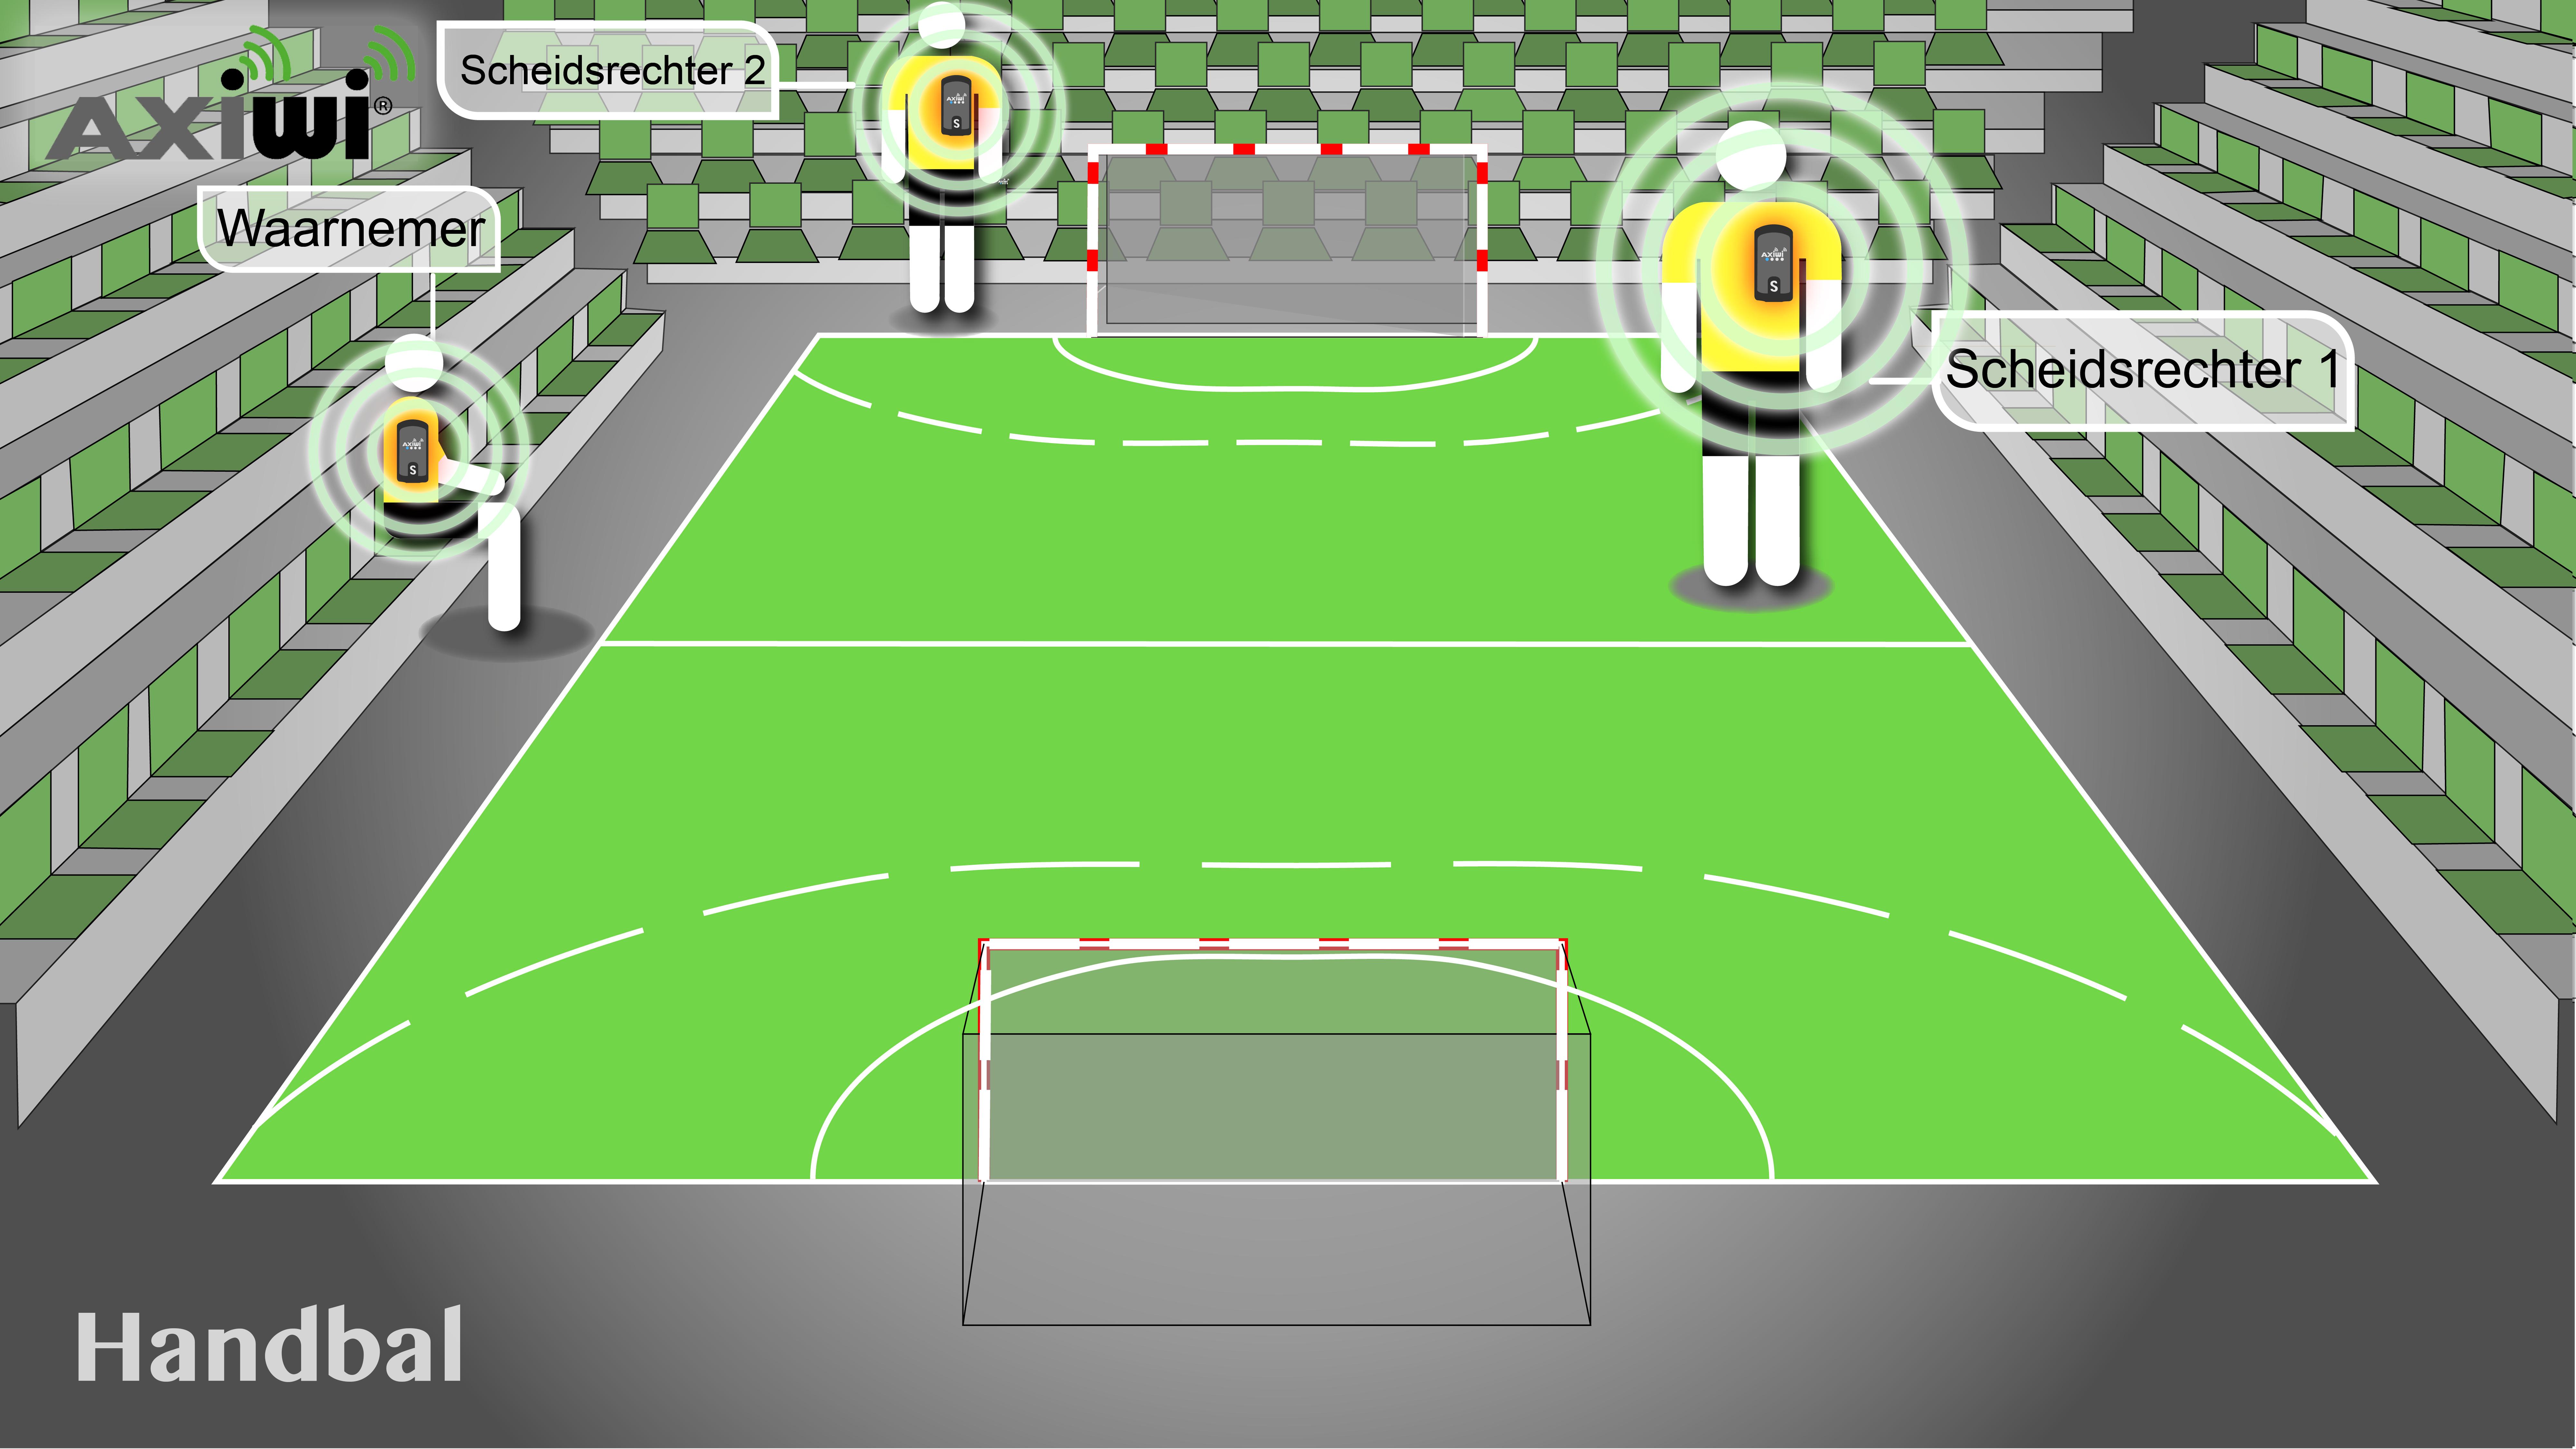 axiwi-communicatie-systeem-scheidsrechter-handbal